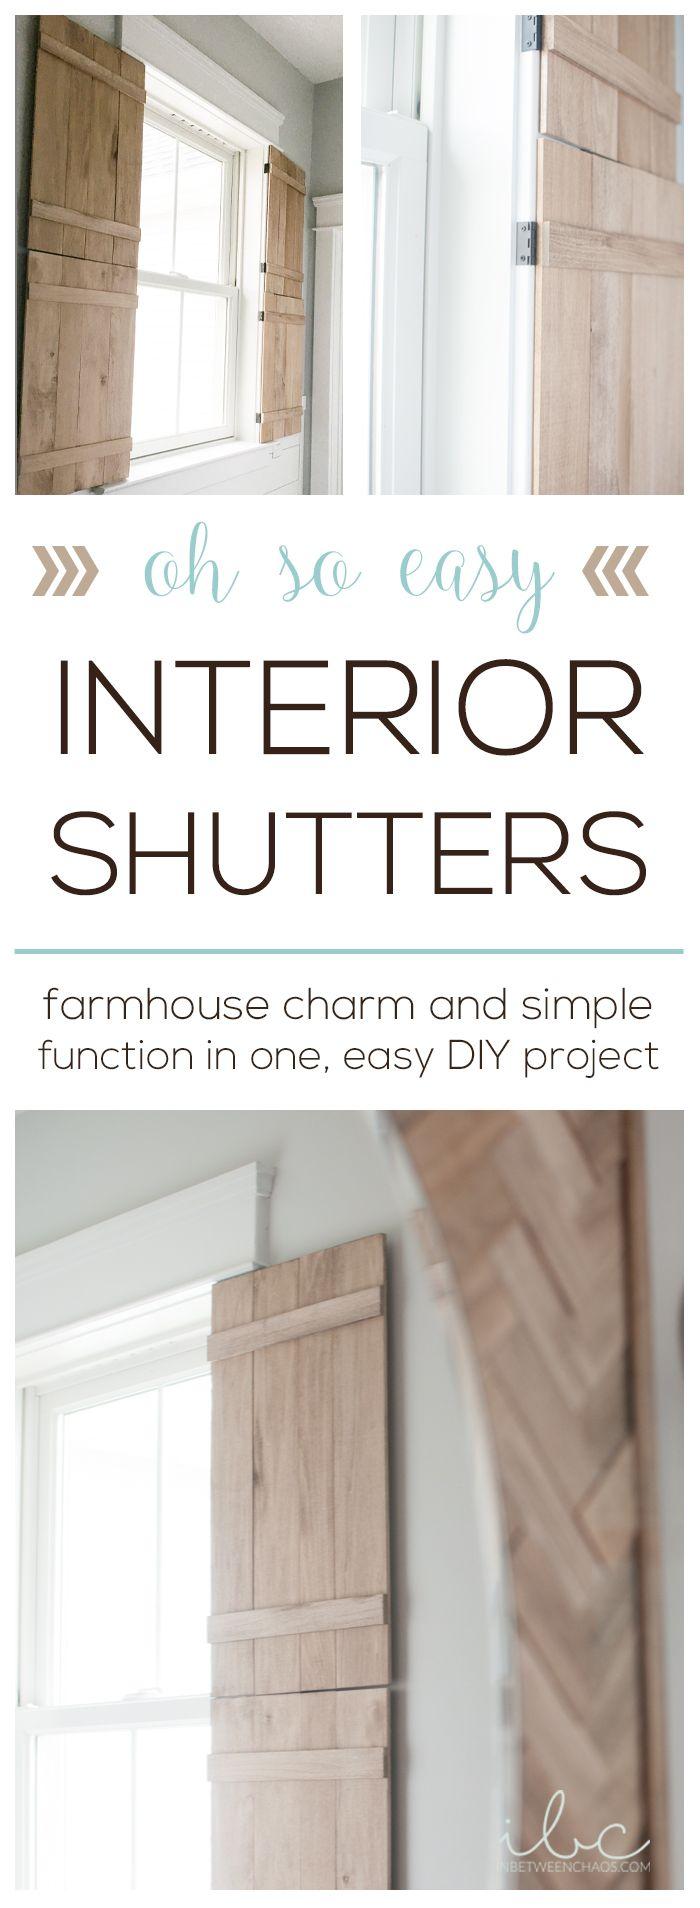 easy farmhouse DIY Interior Shutters | inbetweenchaos.com